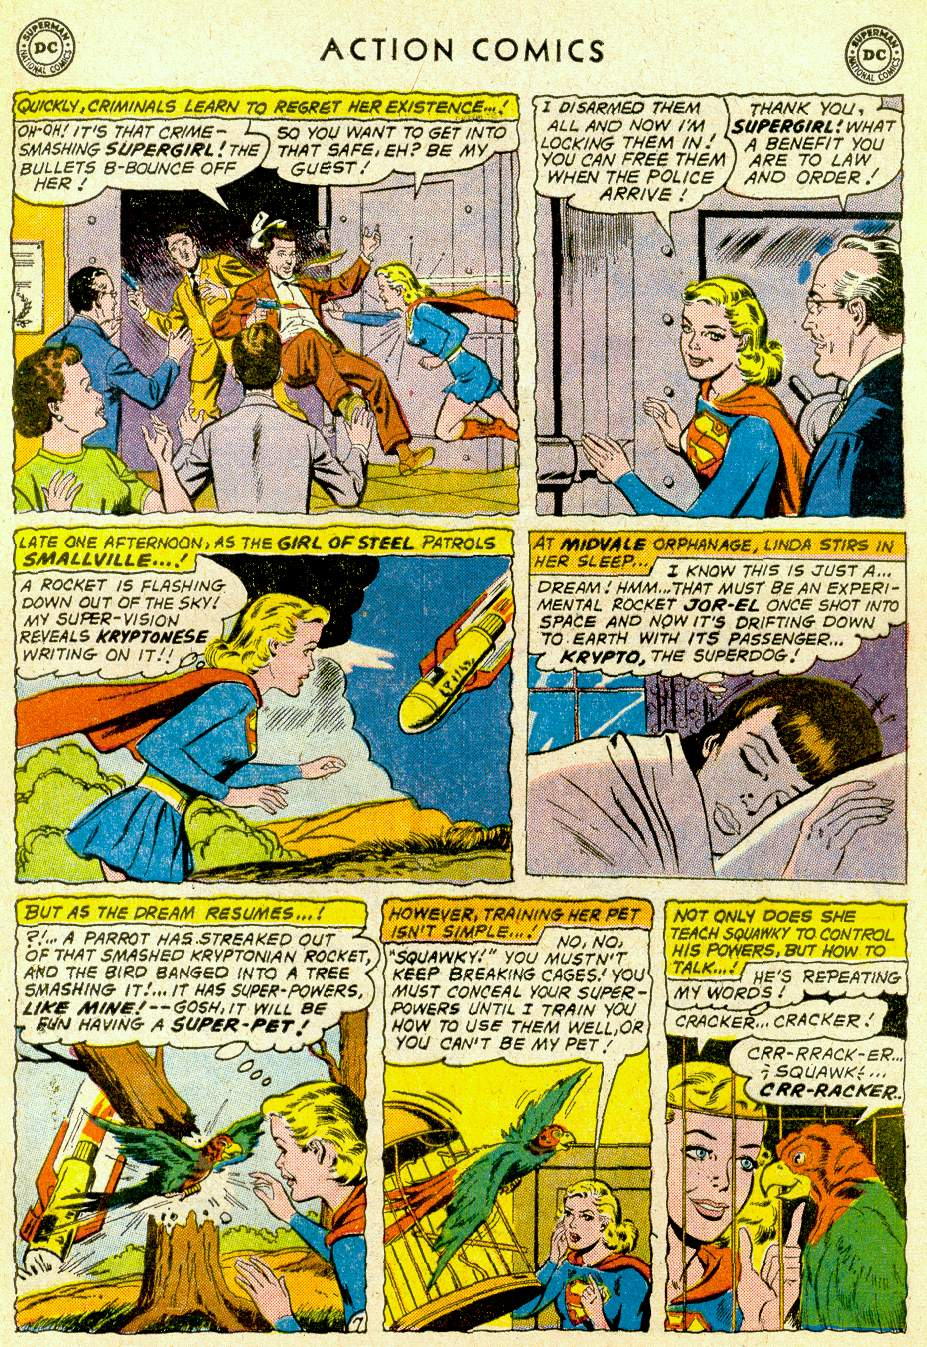 Action Comics (1938) 275 Page 24